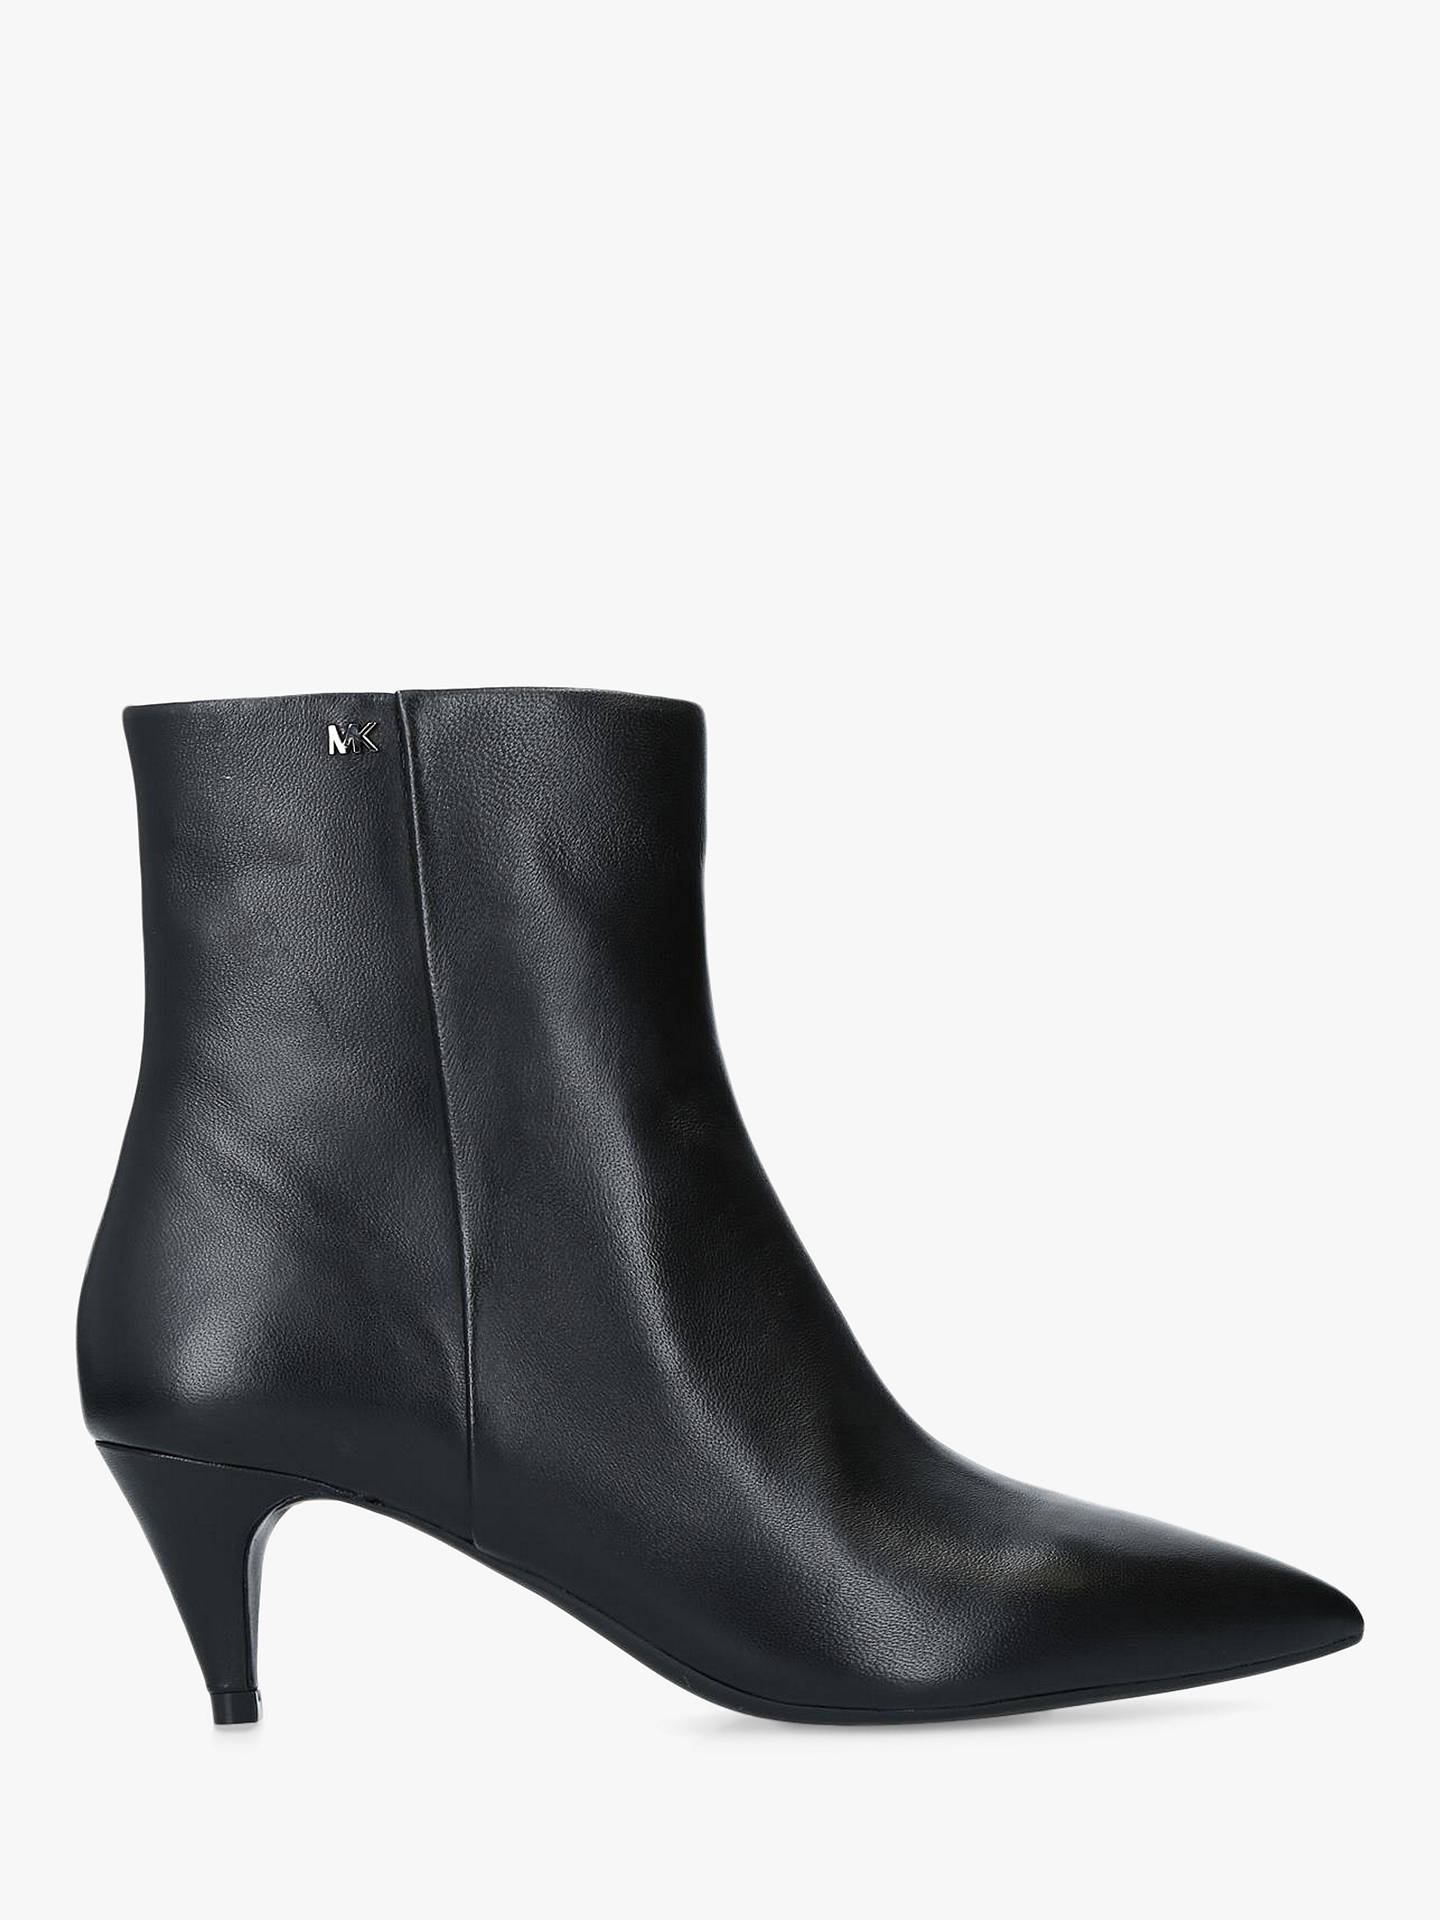 2c312779dc51 Buy MICHAEL Michael Kors Blaine Flex Kitten Heel Ankle Boots, Black  Leather, 7 Online ...